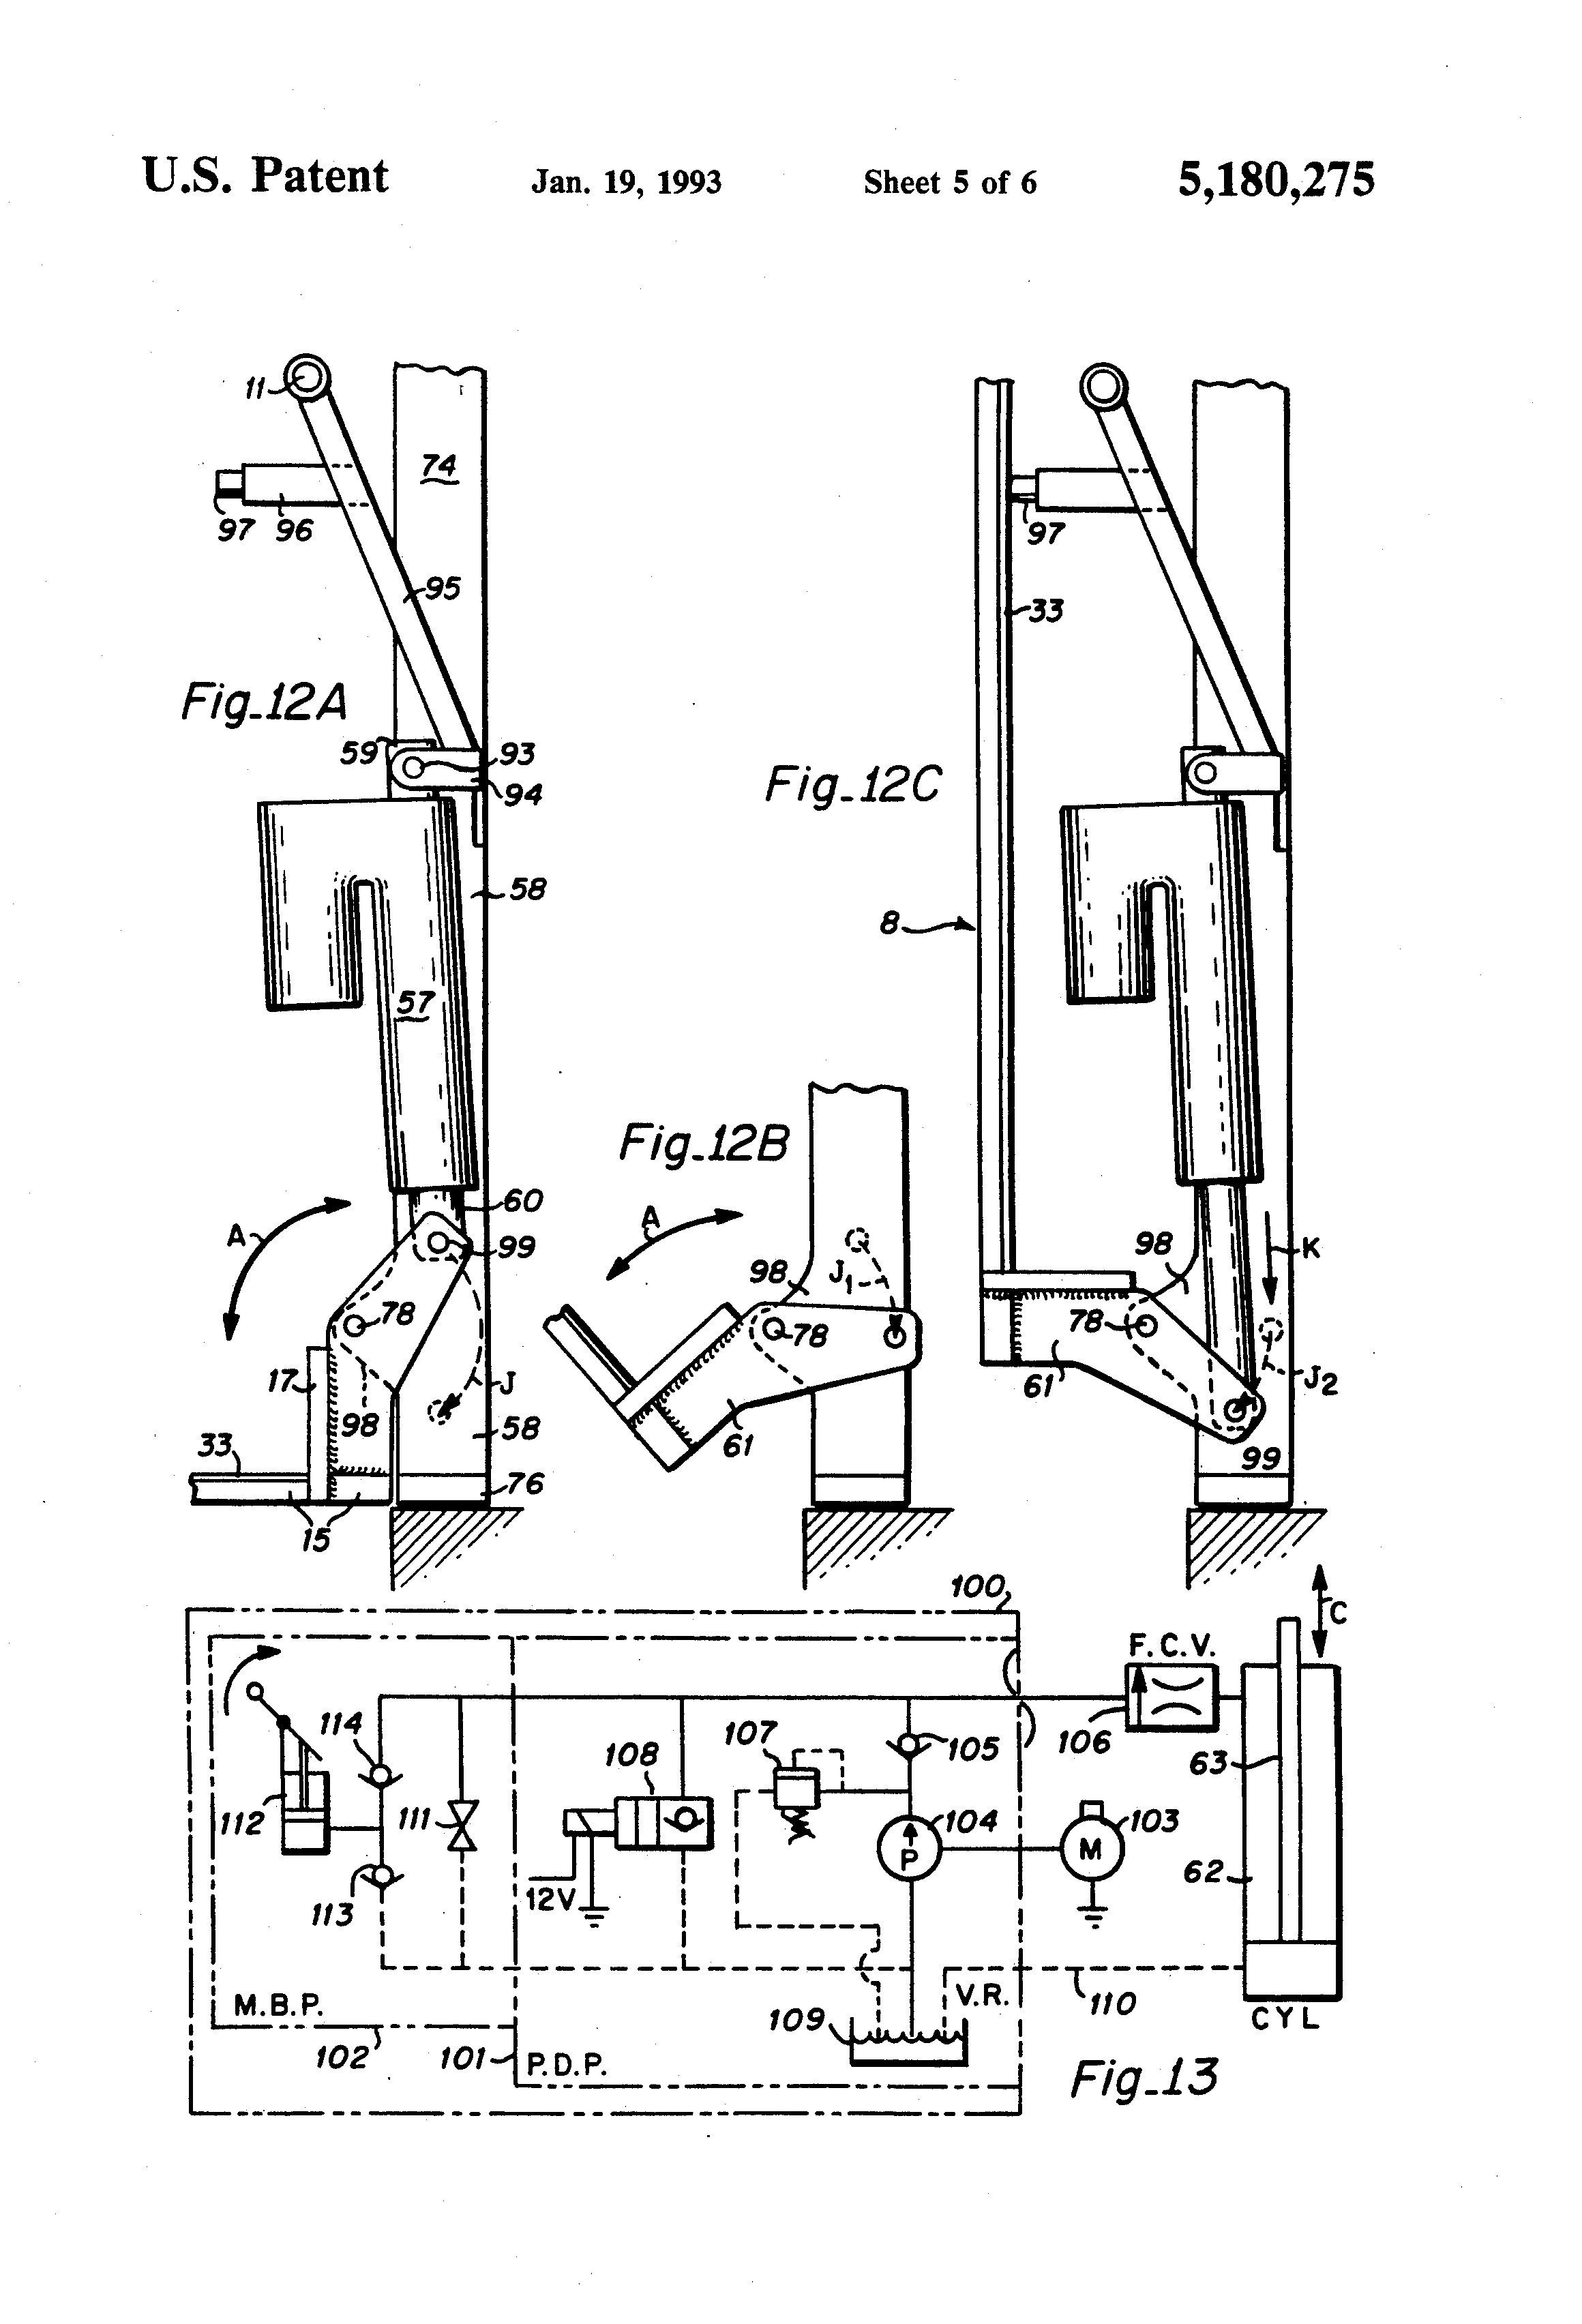 medium resolution of elegant automotive electrical wiring diagram symbols diagrams digramssample diagramimages wiringdiagramsample wiringdiagram